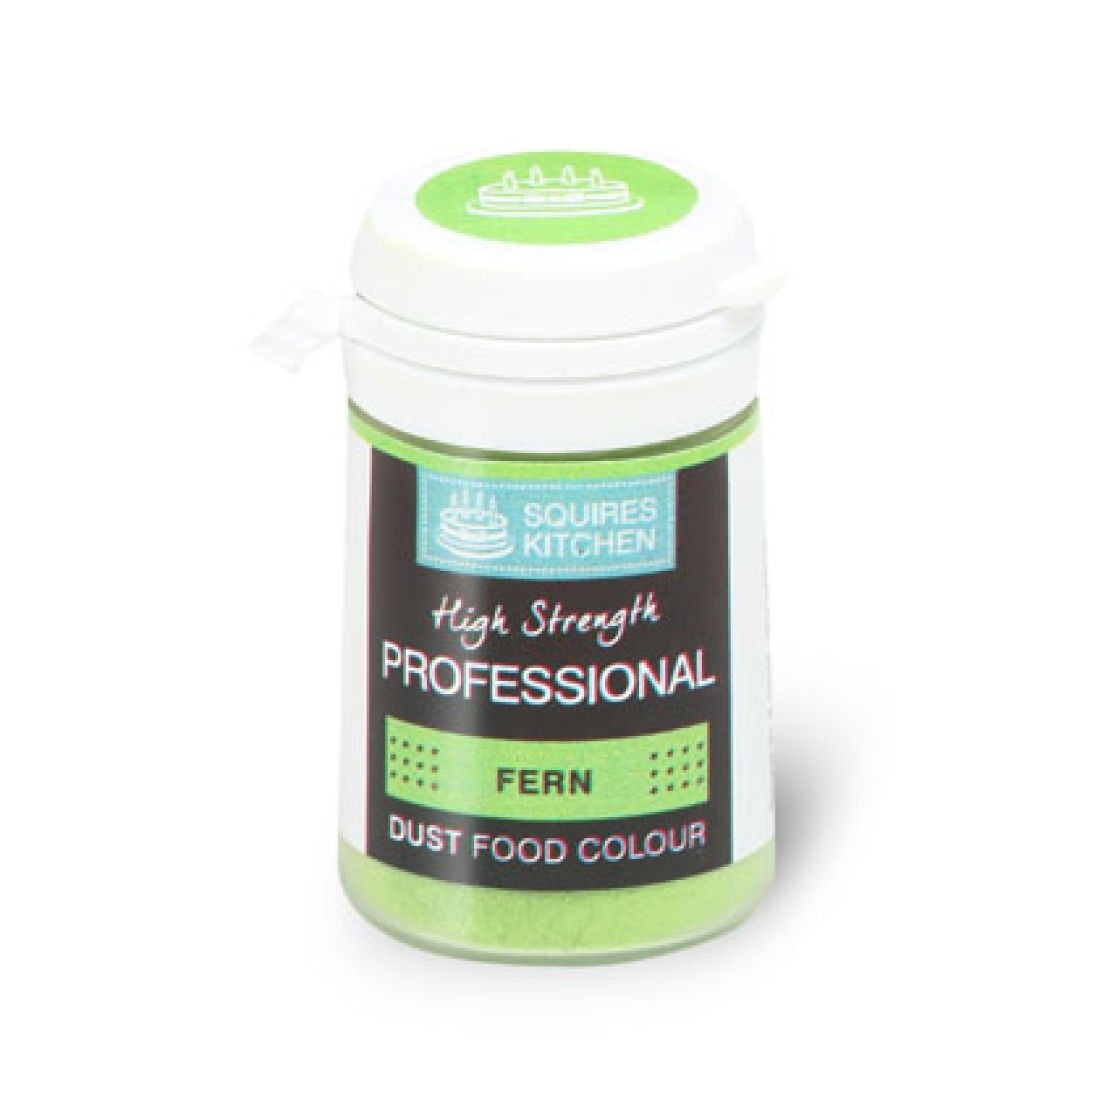 SK Professional Dust Food Colour Fern